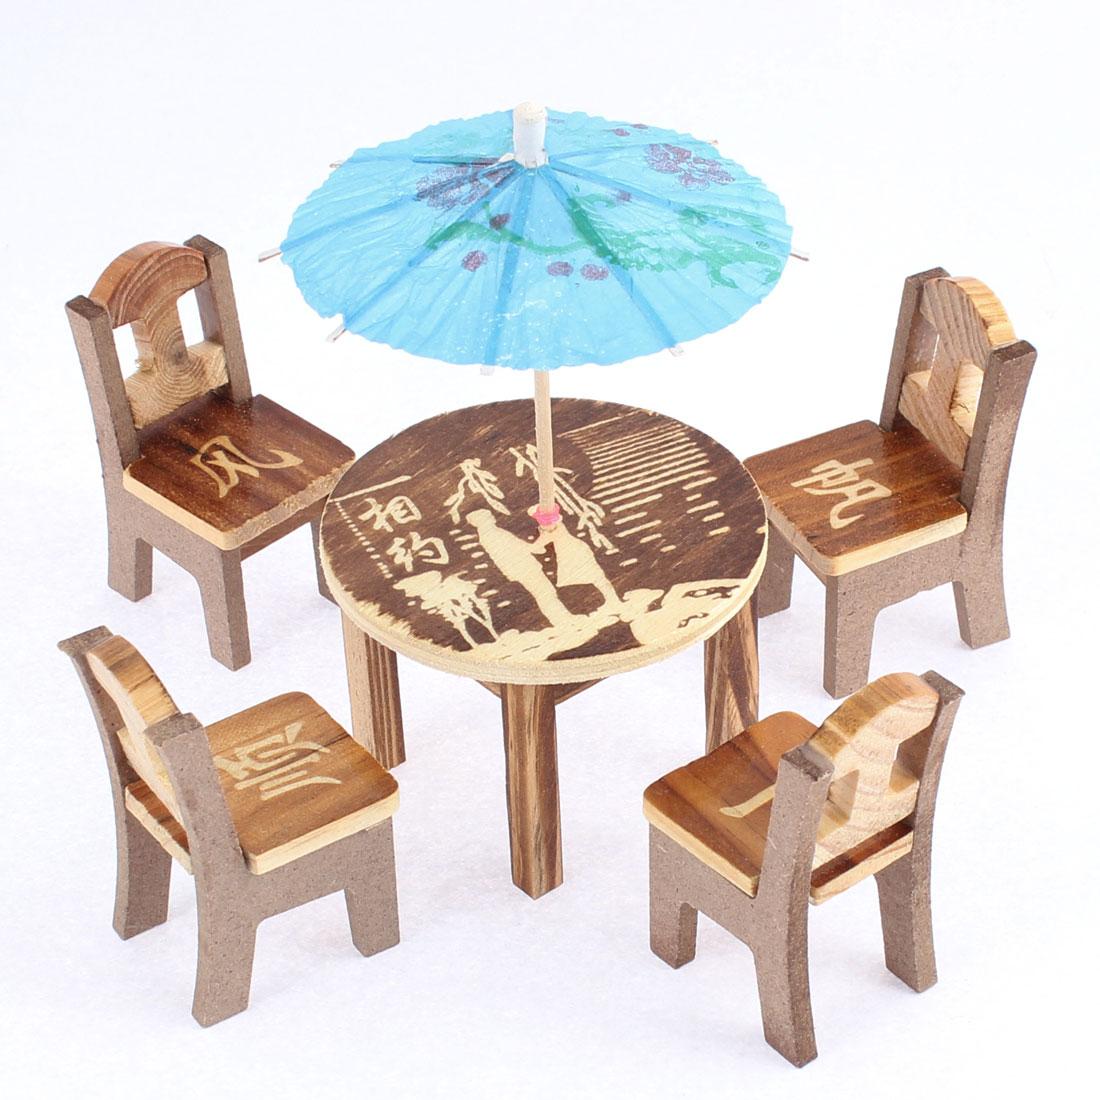 Home Office Wooden Desktop Decoration Display Simulative Mini Table Desk Umbrella Set